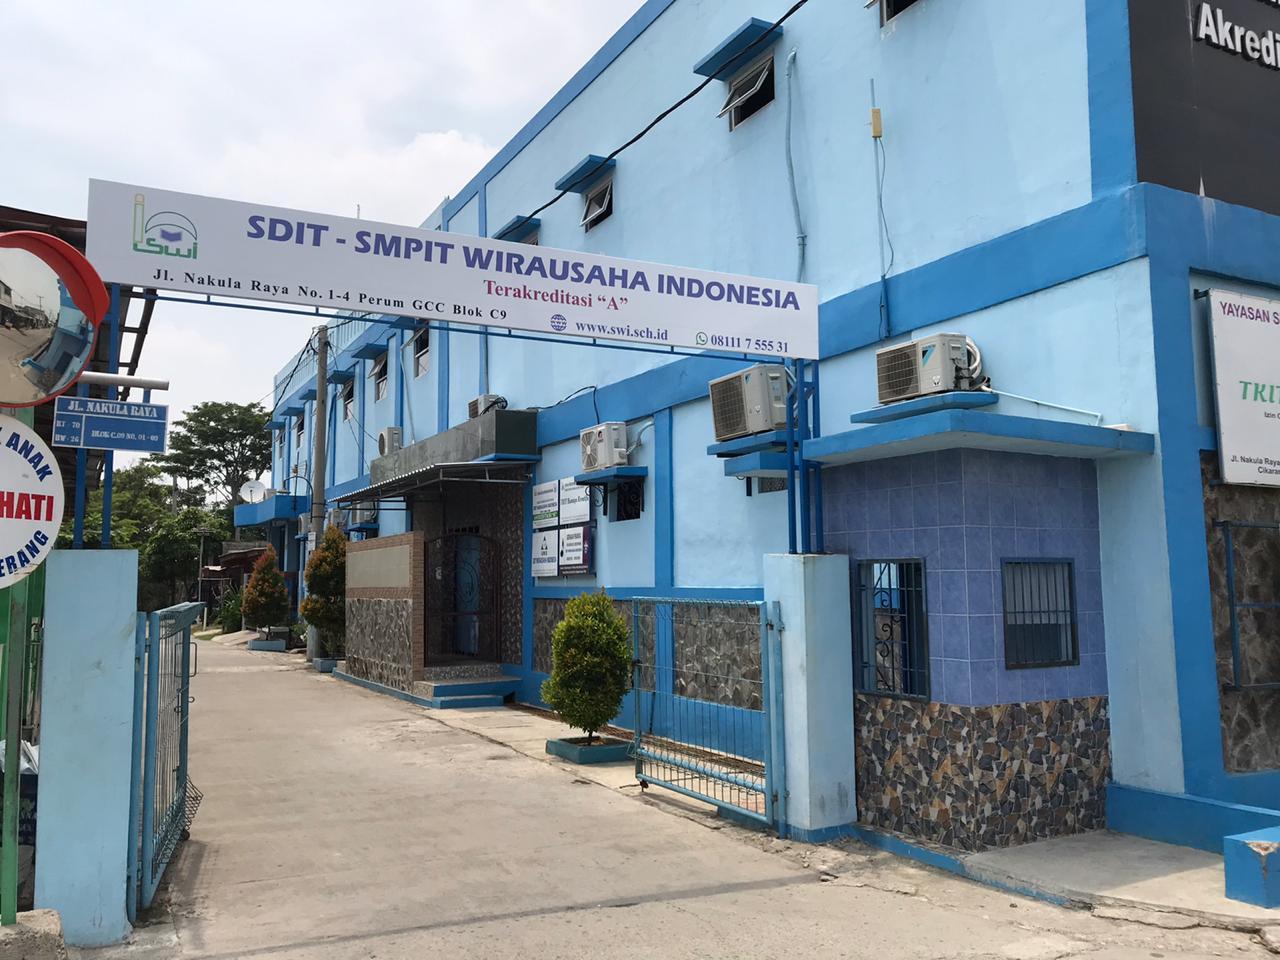 YSWI Kini Selenggarakan Sekolah Menengah Pertama; SMPIT Wirausaha Indonesia